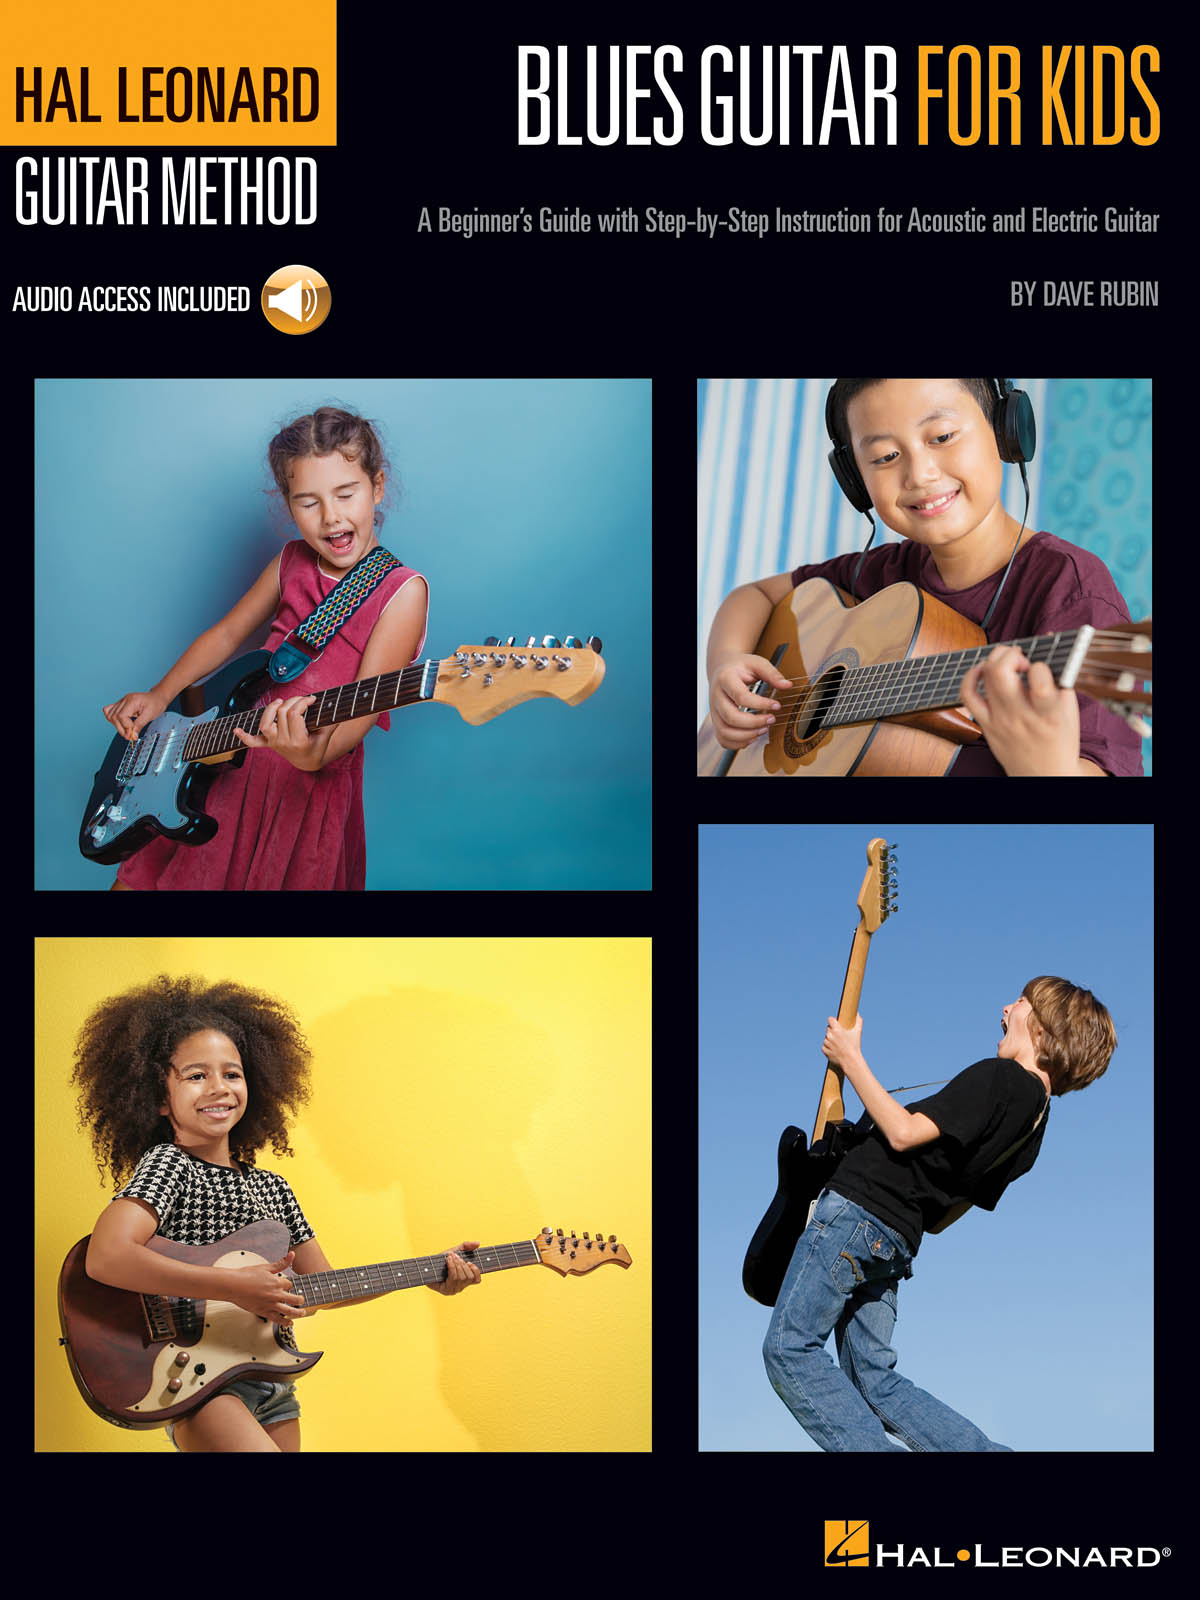 Hal Leonard Guitar Method - Blues Guitar For Kids